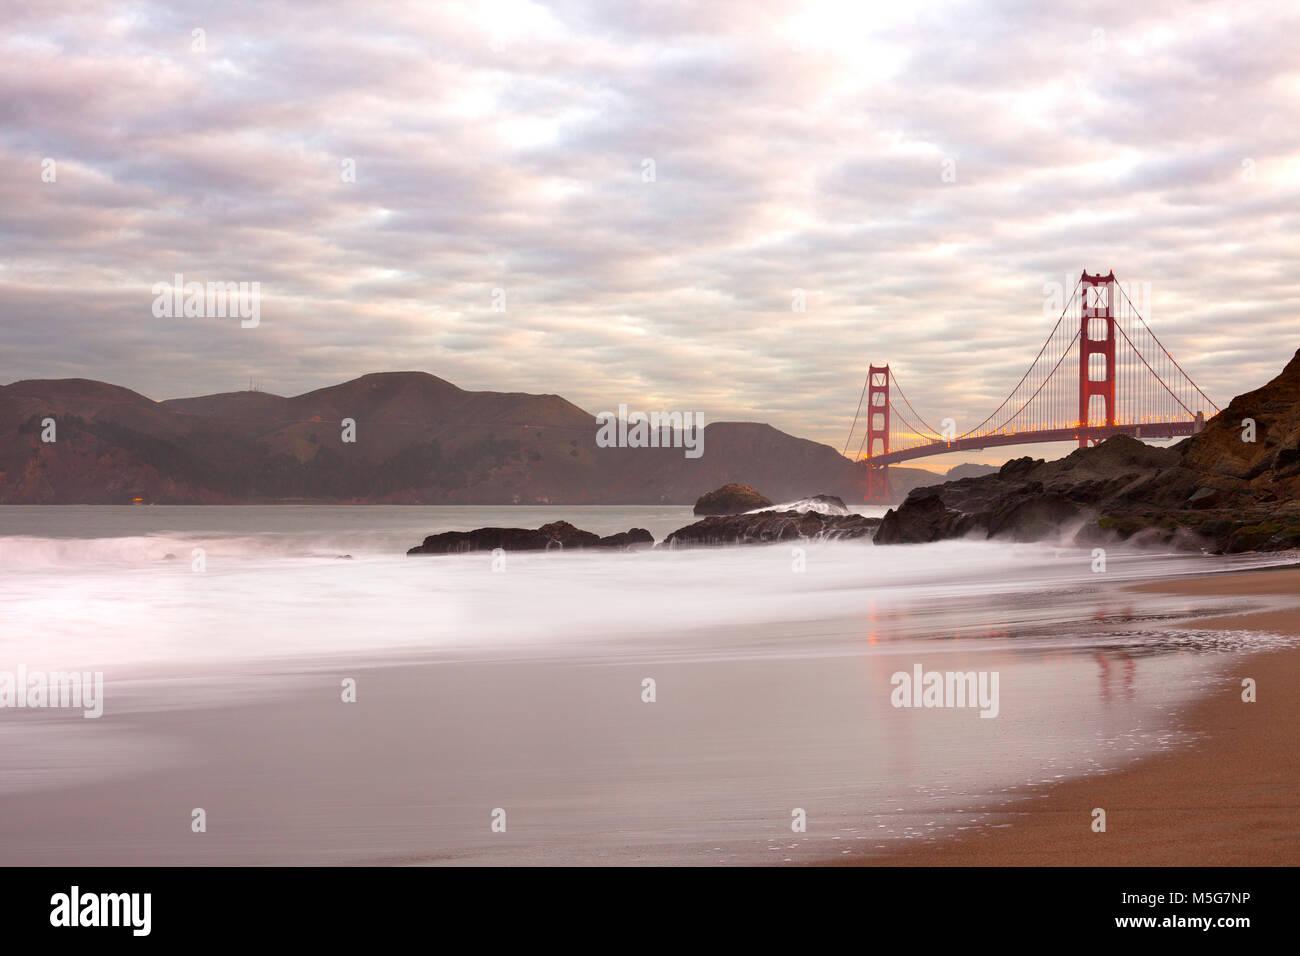 Golden Gate Bridge da Baker Beach, San Francisco, California, Stati Uniti d'America Foto Stock